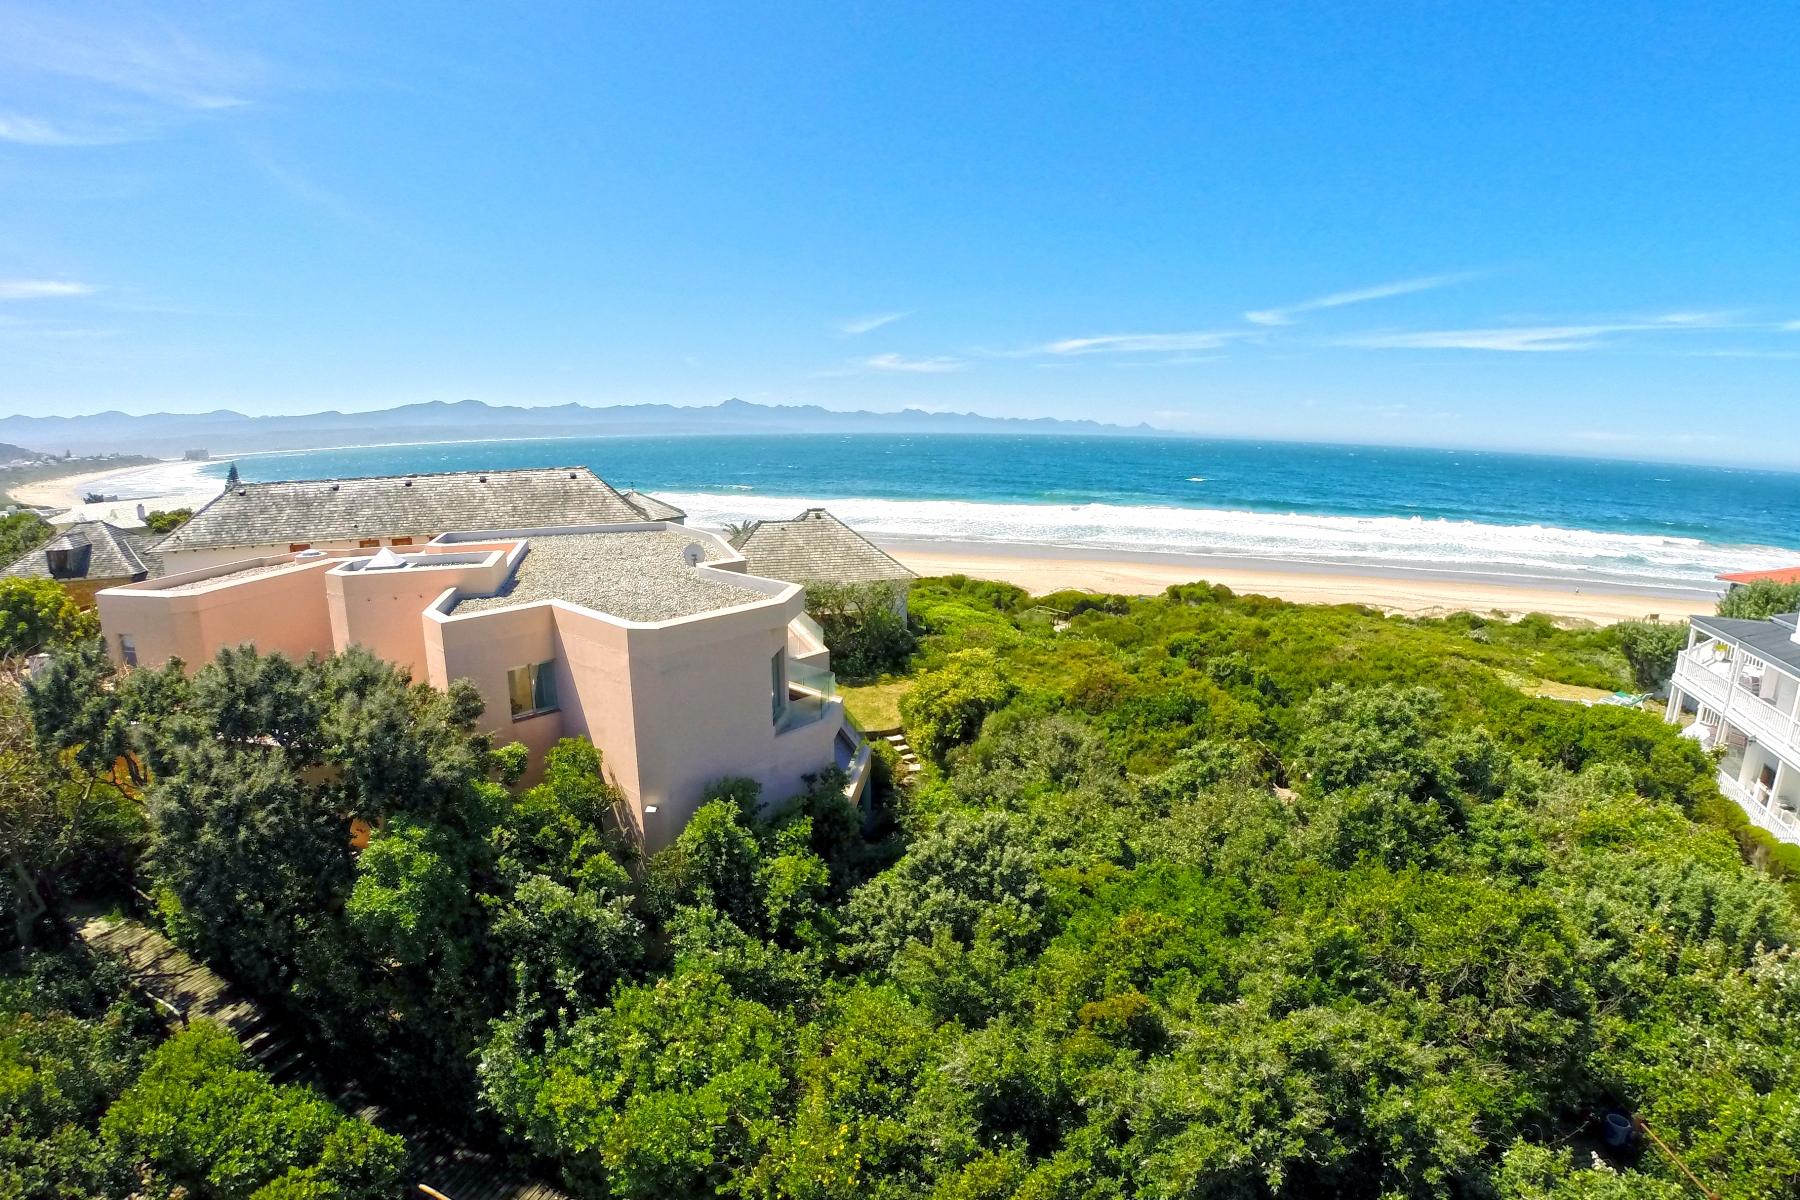 Casa Unifamiliar por un Venta en Beach Living Plettenberg Bay, Provincia Occidental Del Cabo, 6600 Sudáfrica